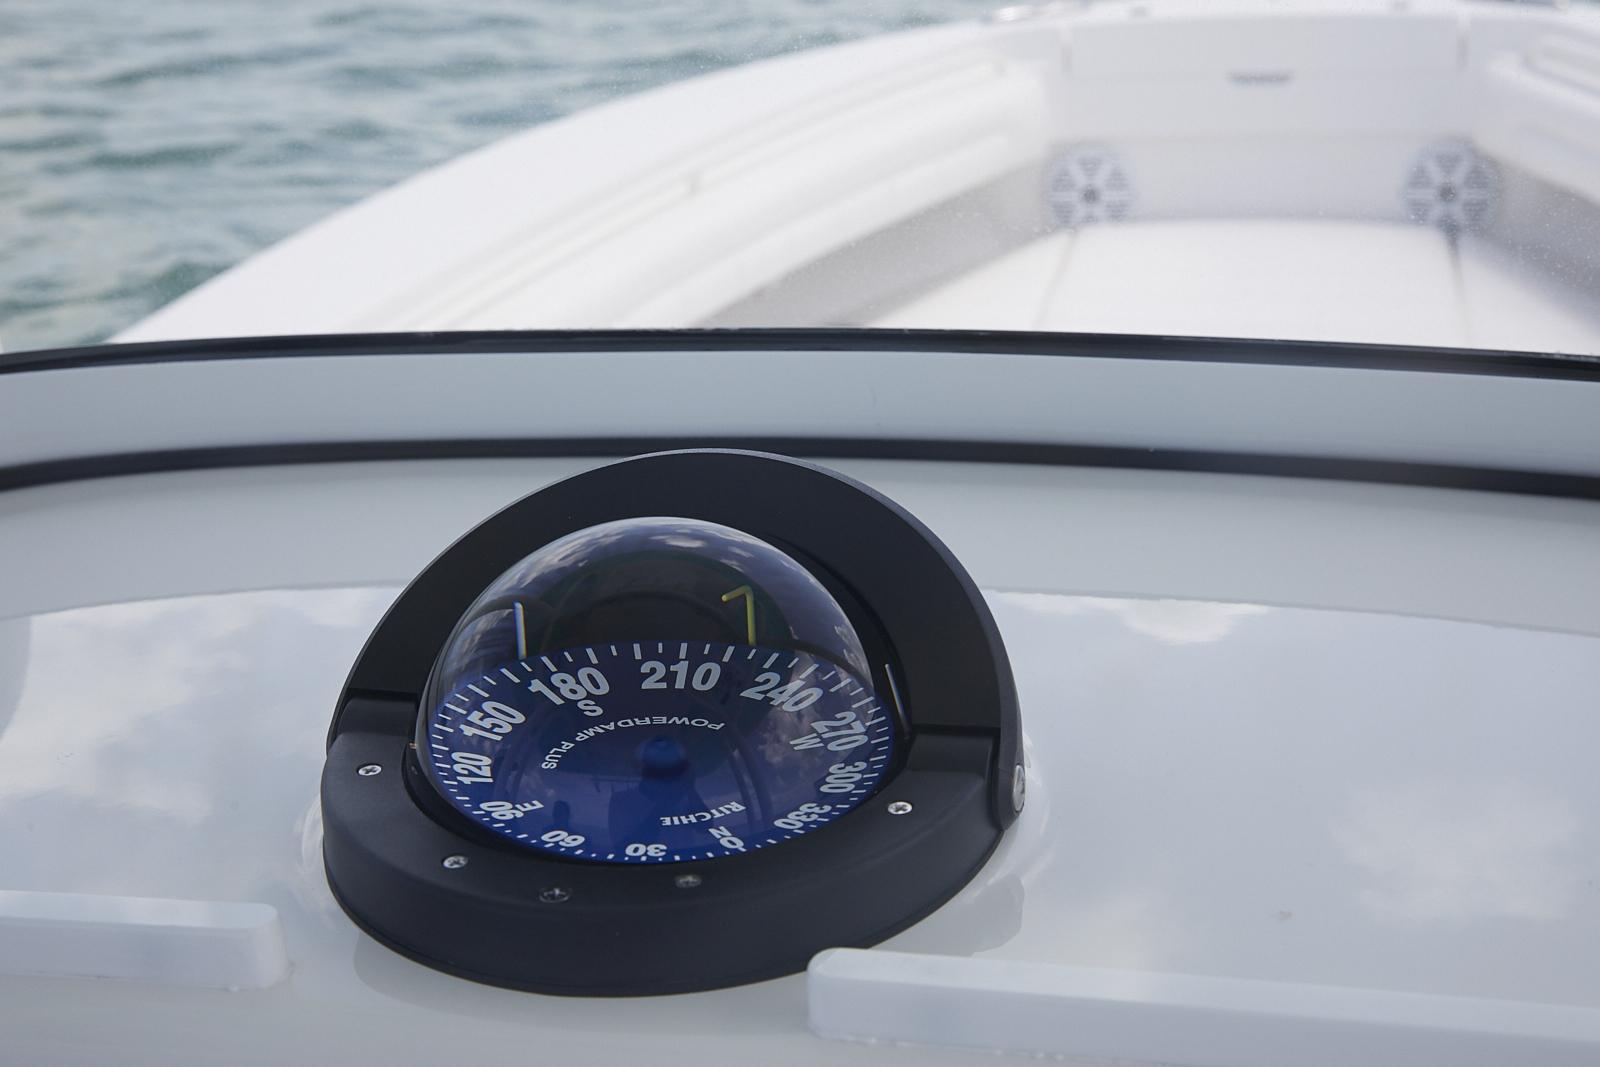 Regulator 25 | Regulator Marine Boats